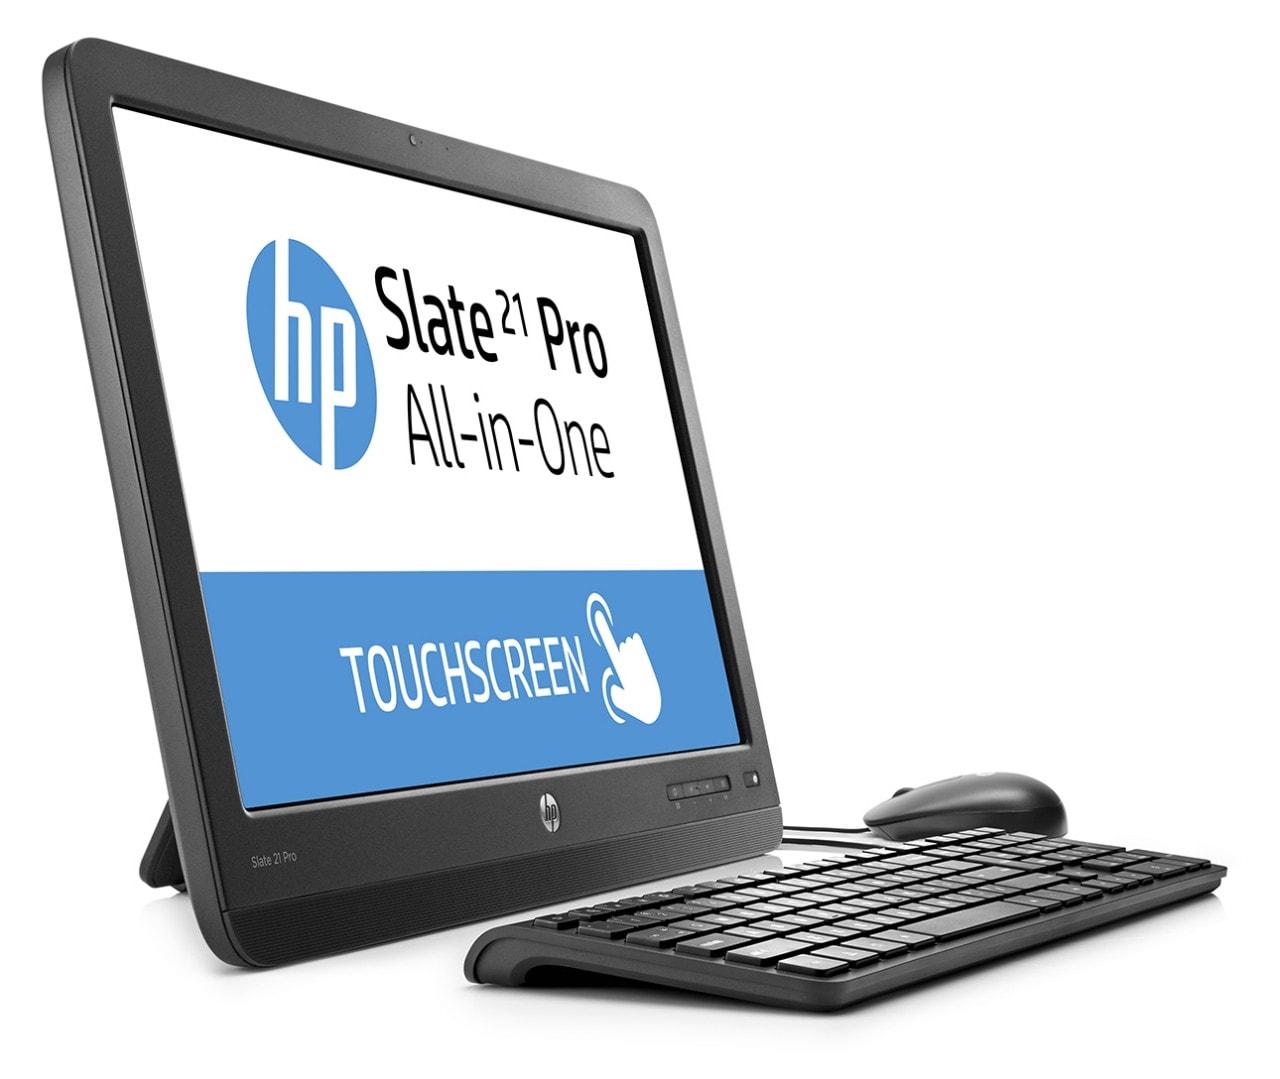 HP_Slate_21_Pro_2